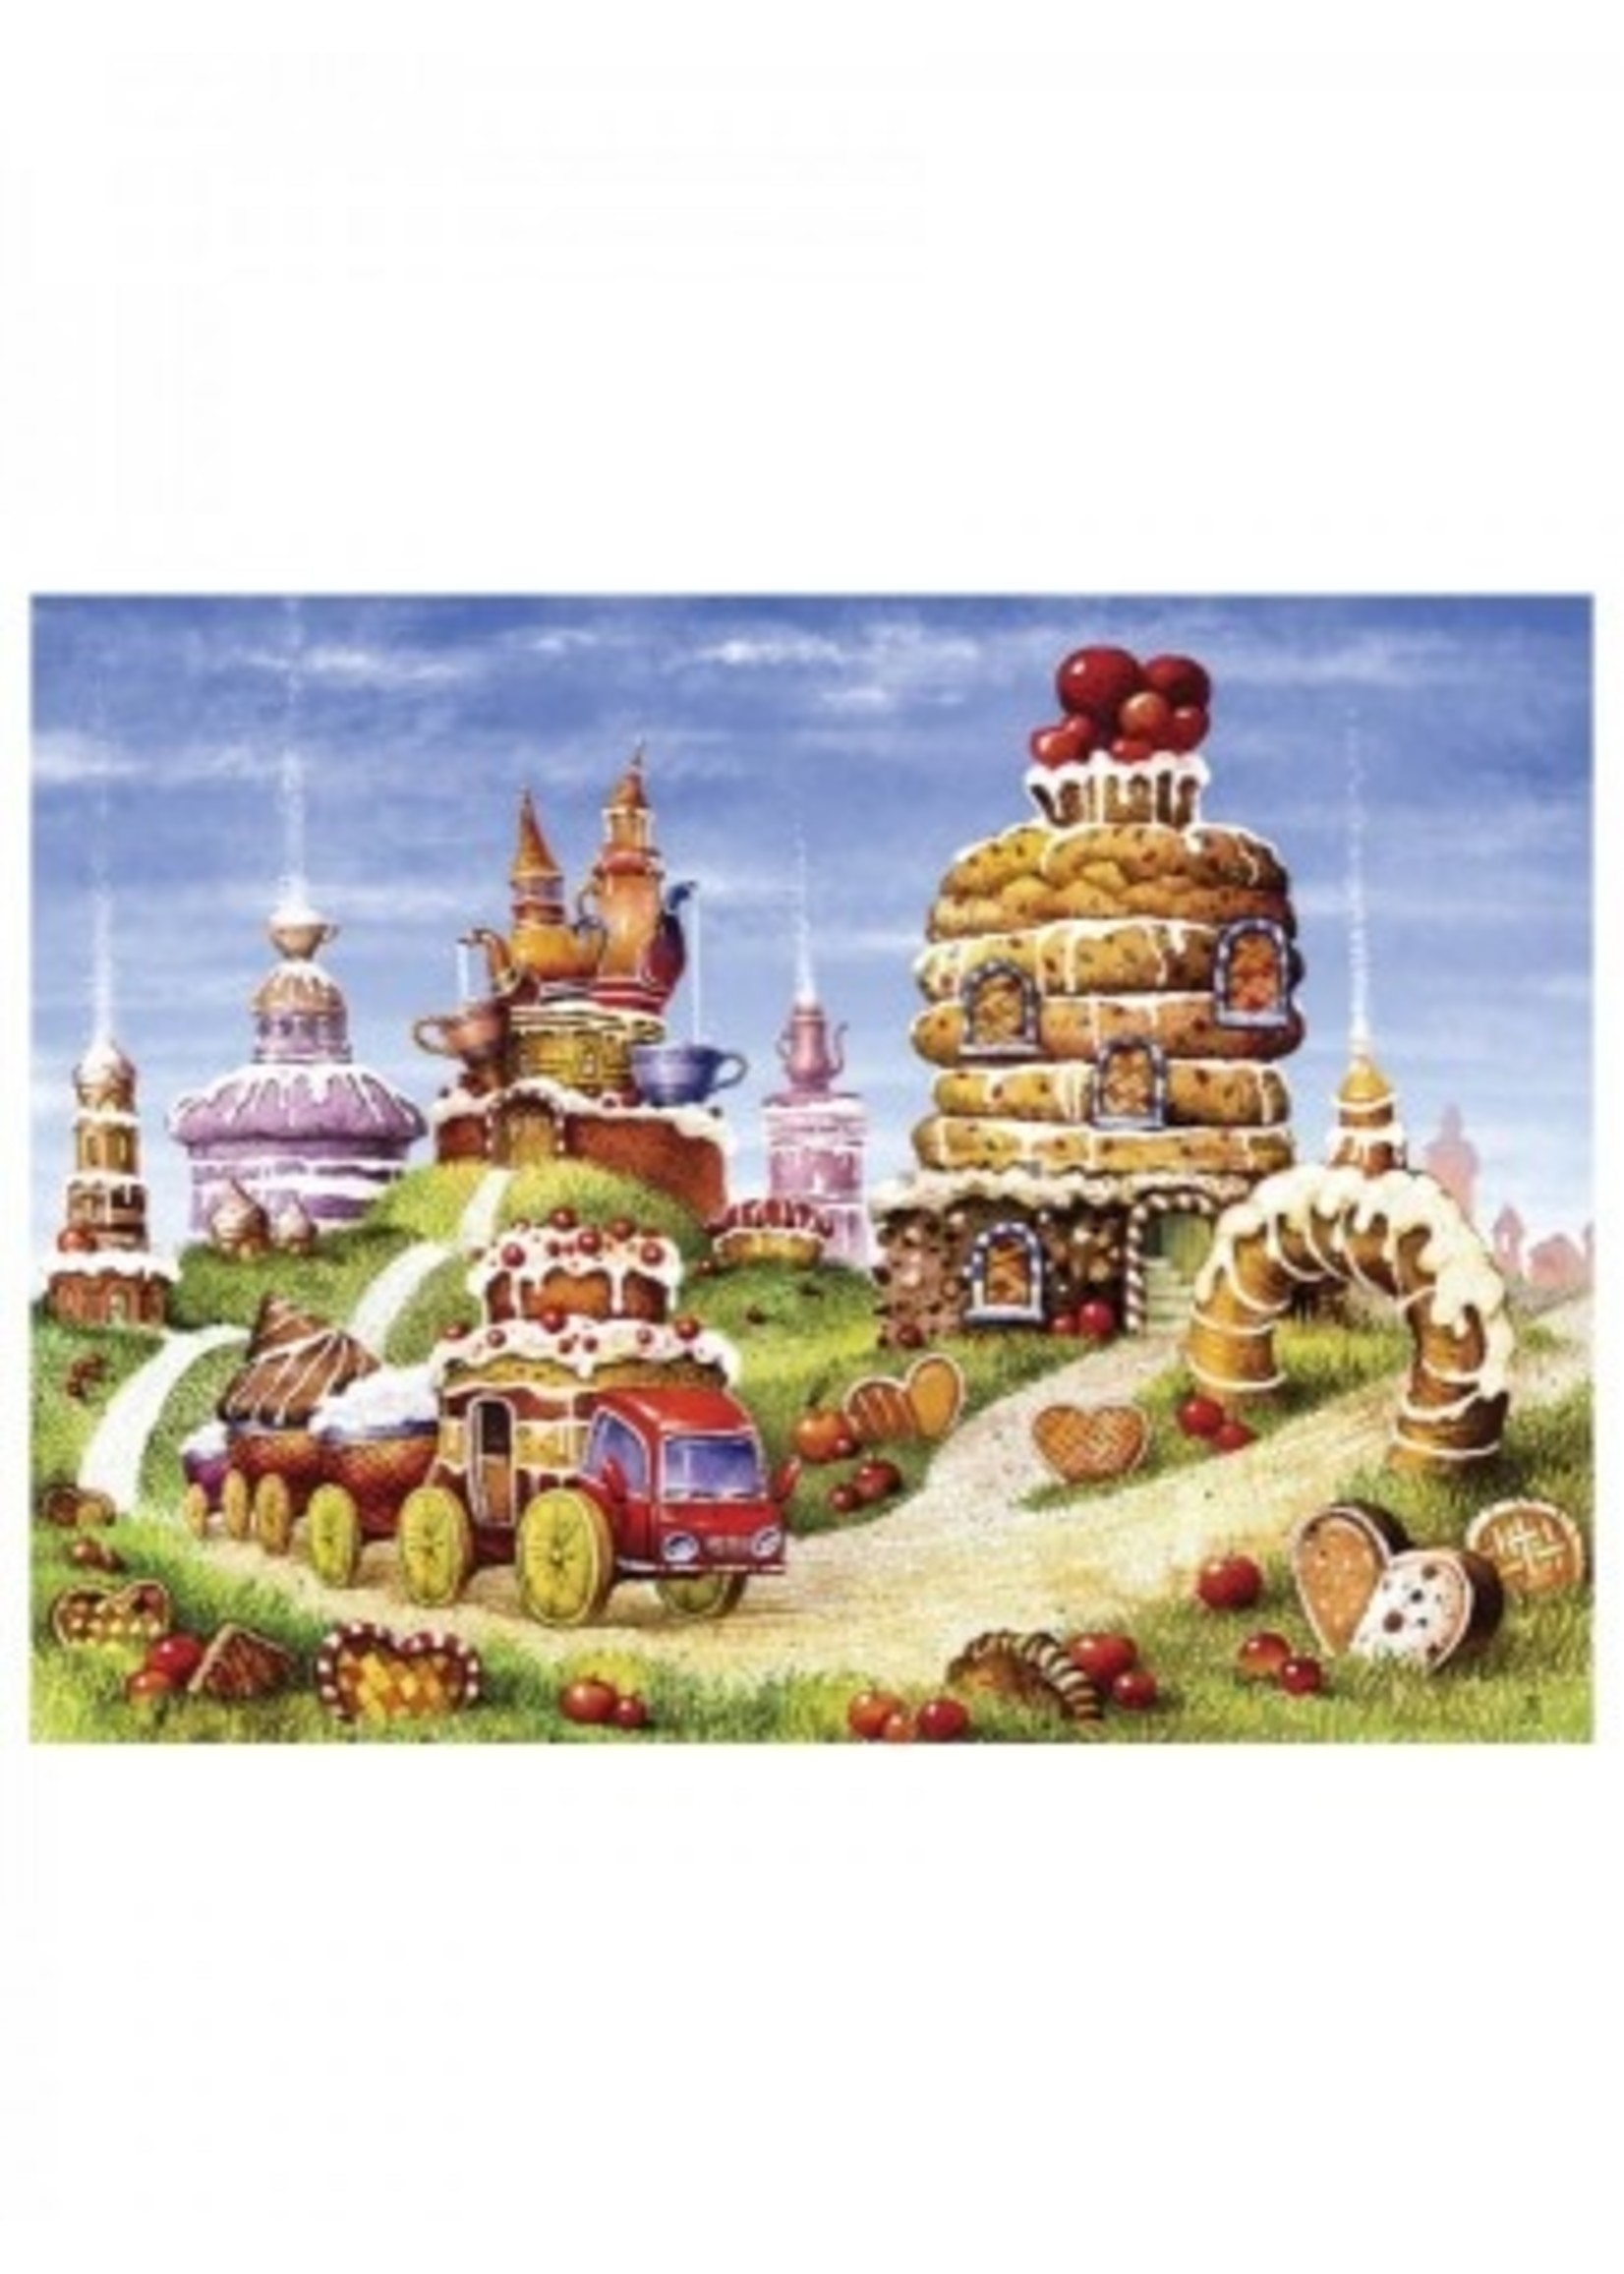 DaVICI Puzzel™ - Koekjesfabriek (170) - Houten Puzzel